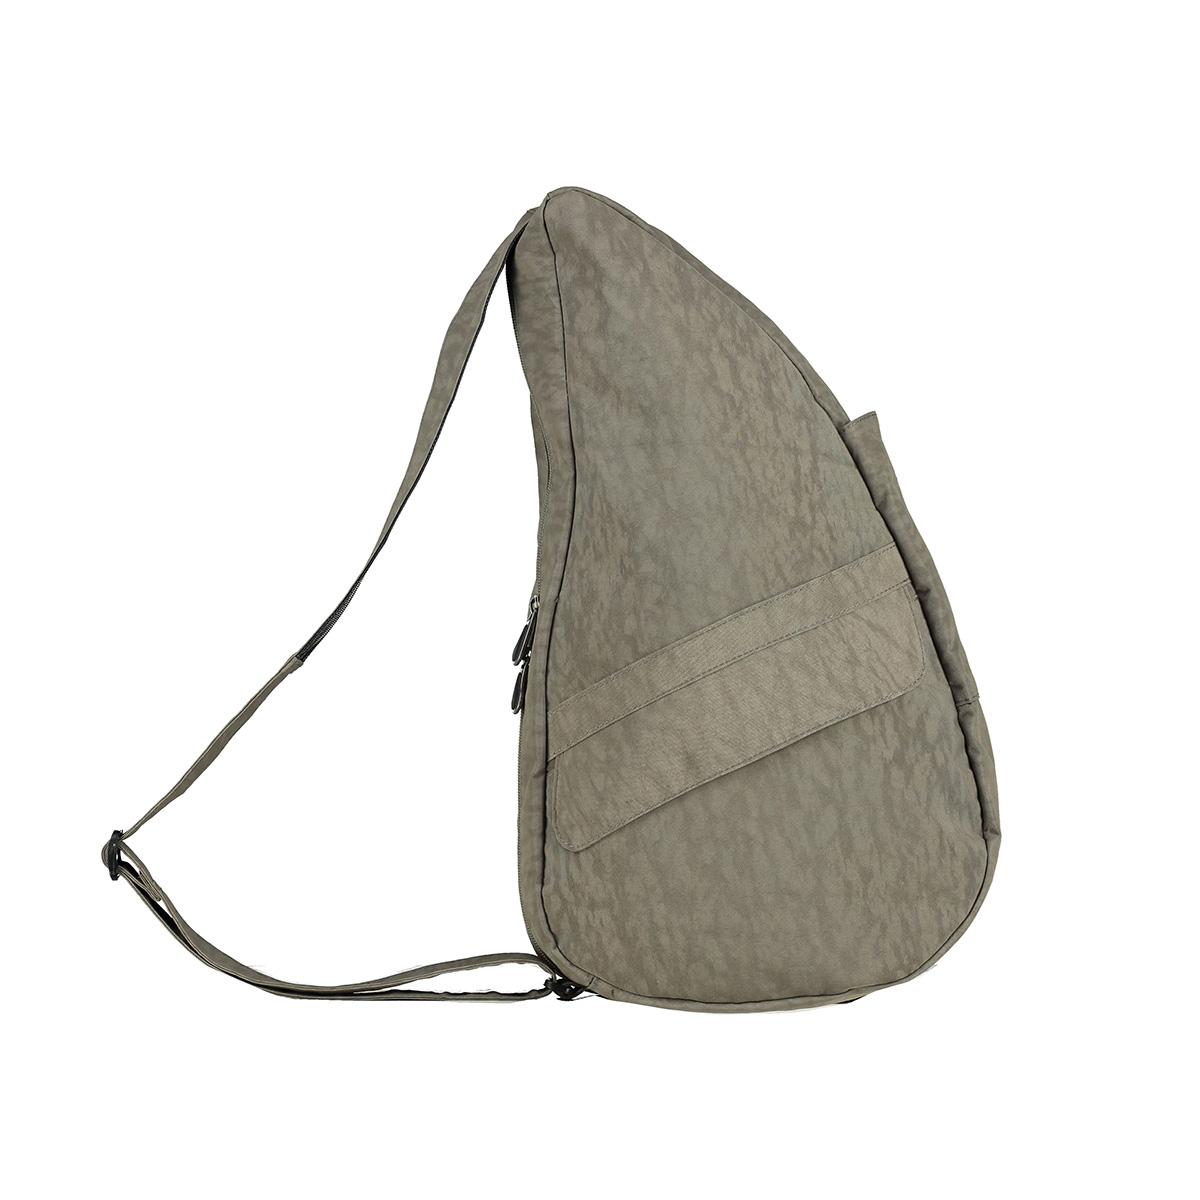 Healthy Back Bag/ヘルシーバックバッグ/ショルダーバッグ/ボディバッグ/旅行バッグ/軽量/レディース/メンズ 《限定ポーチ付》 公式ストア ヘルシーバックバッグ テクスチャードナイロン Mサイズ トリュフ